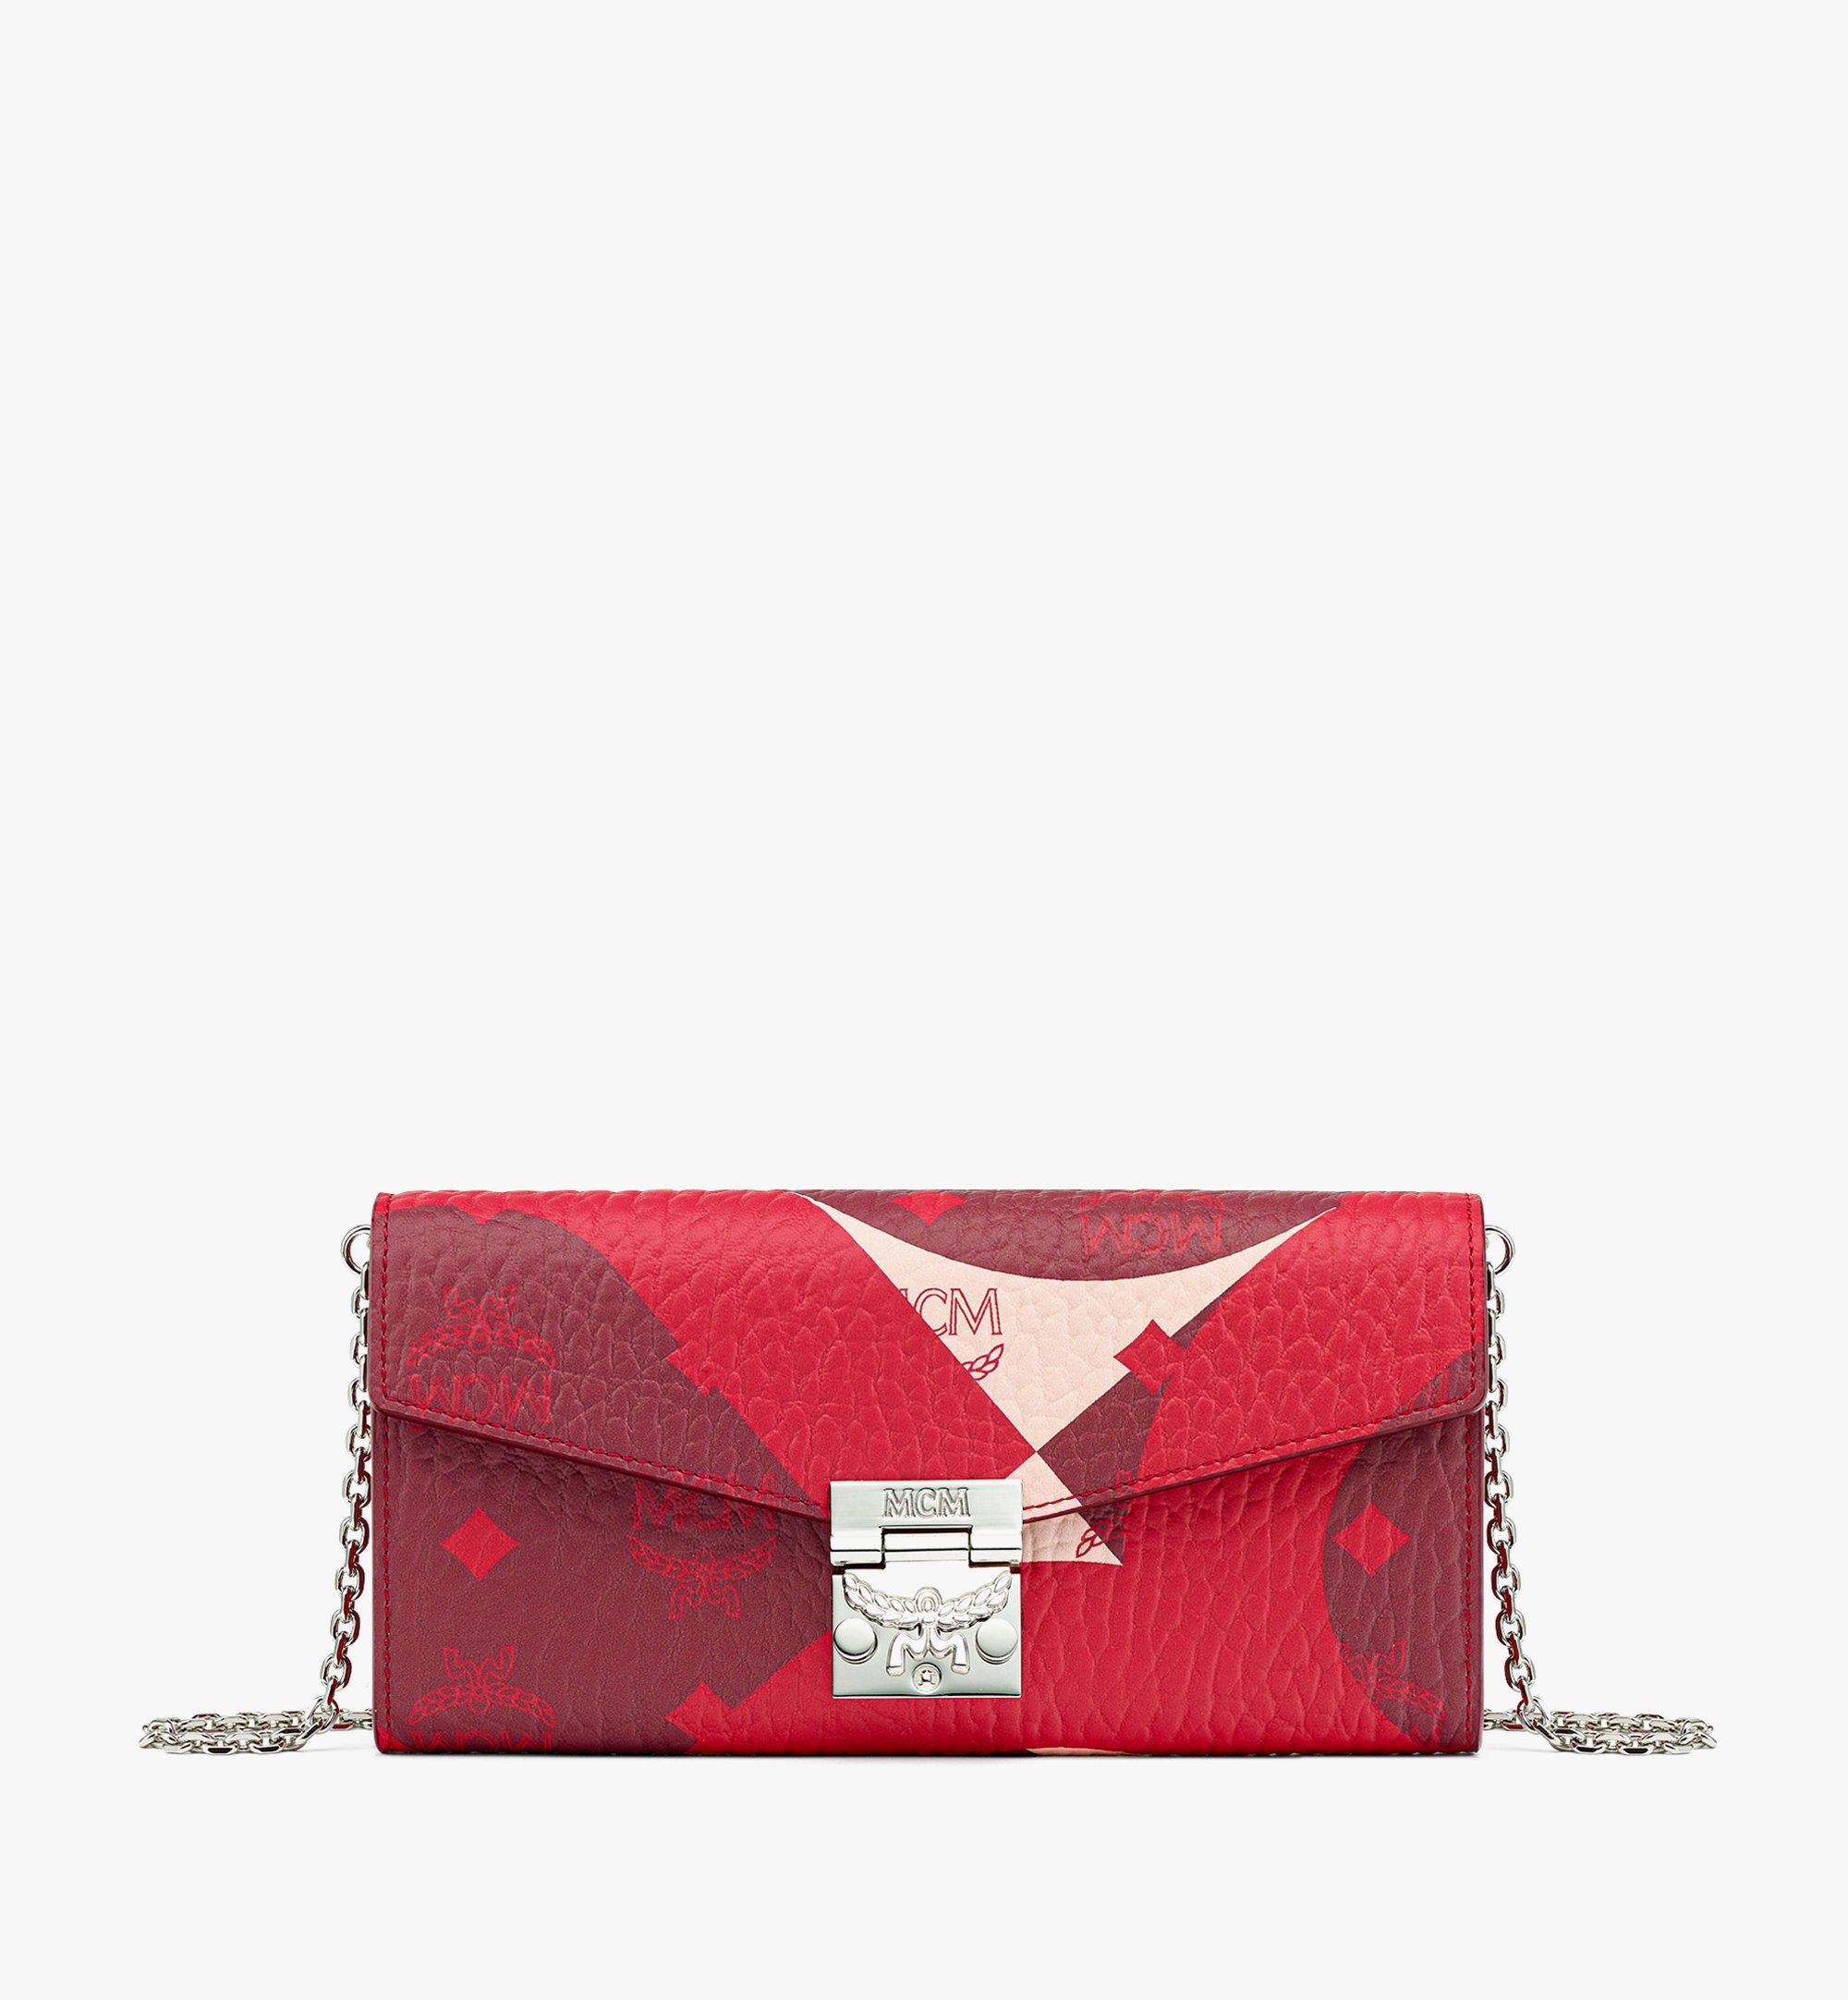 MCM Patricia Crossbody Wallet in Wave Visetos Red MYLBASX02R0001 Alternate View 1